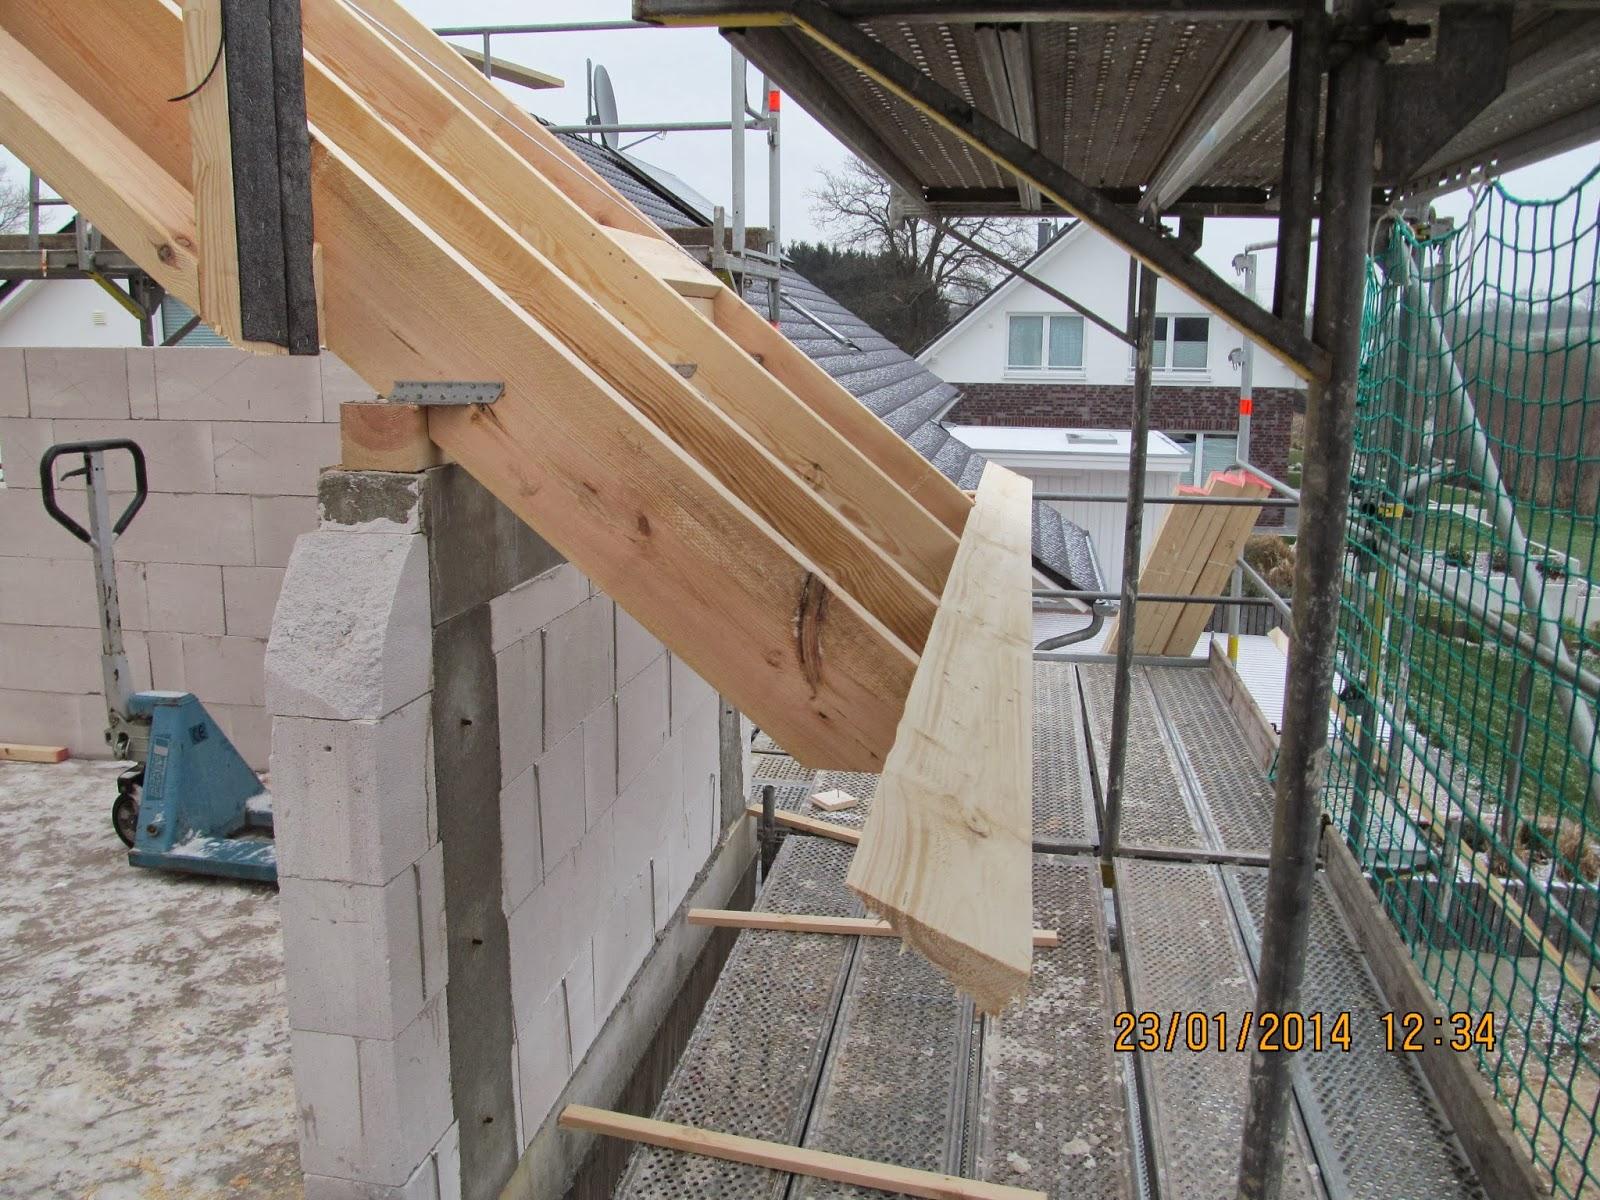 Traufbohle  Unser Luftschloss: Dachstuhl - Fortschritte